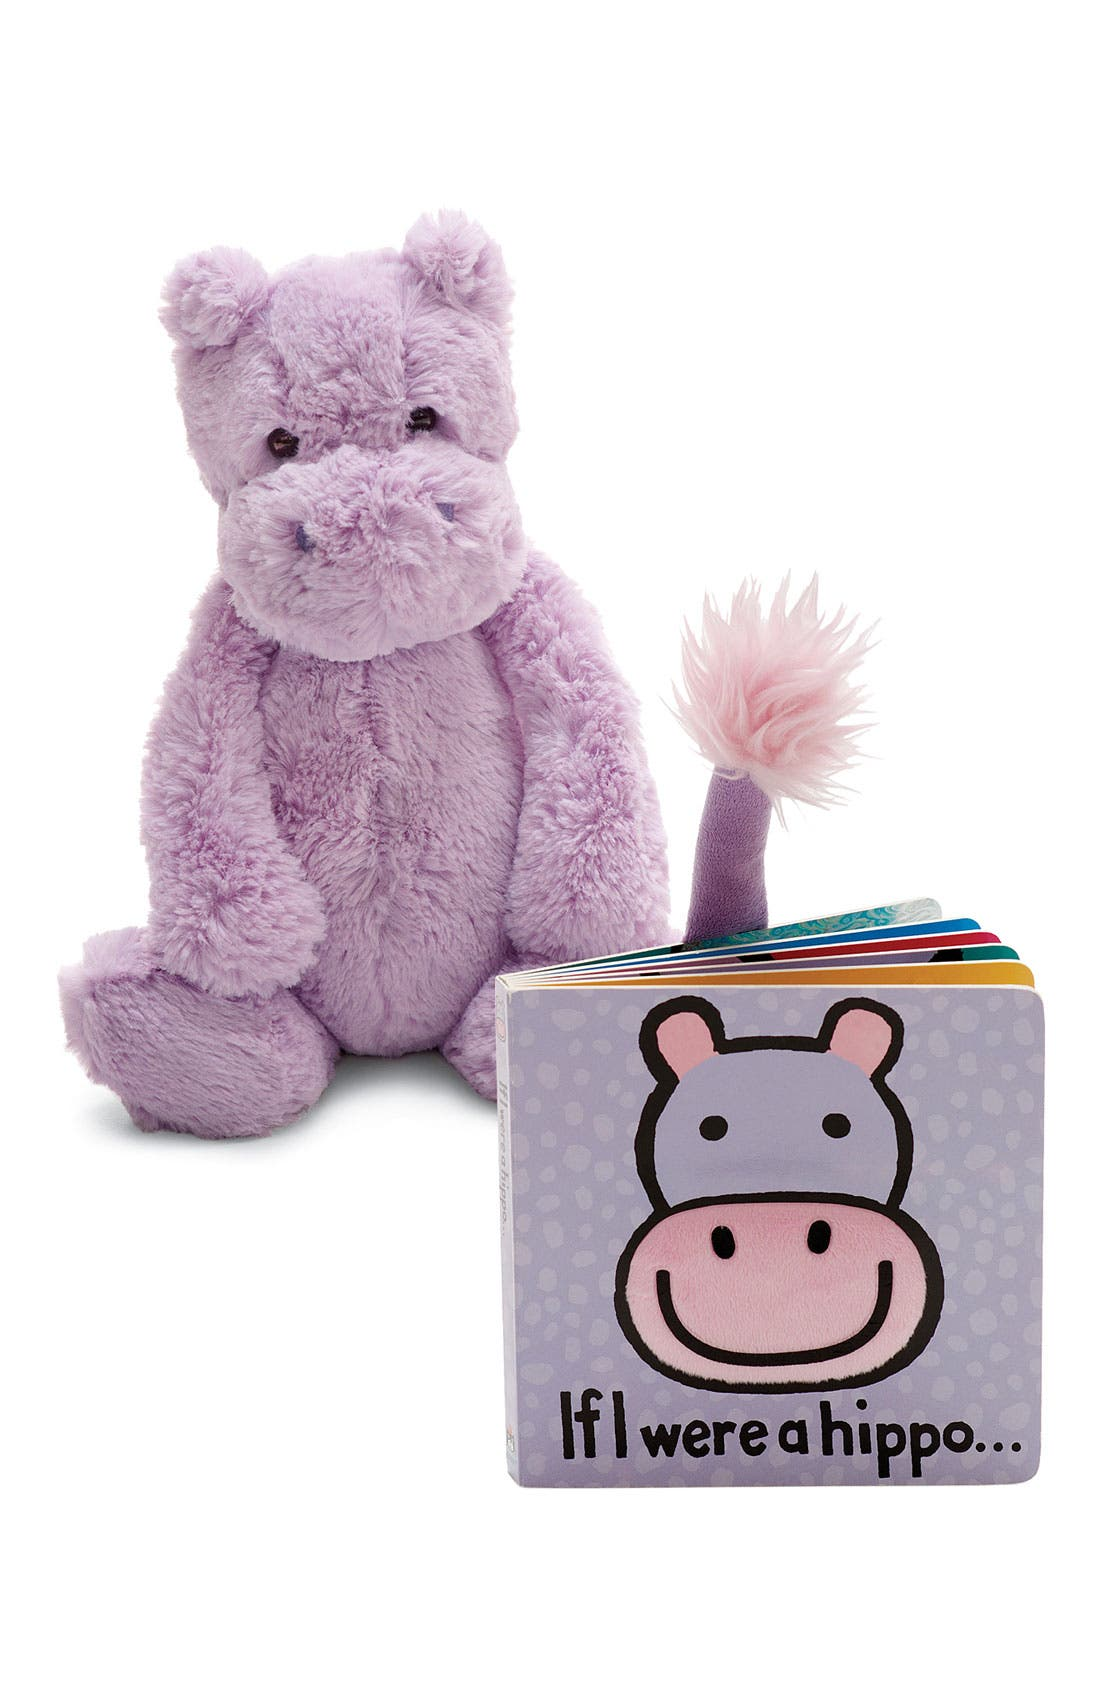 Alternate Image 1 Selected - Jellycat Board Book & Stuffed Animal